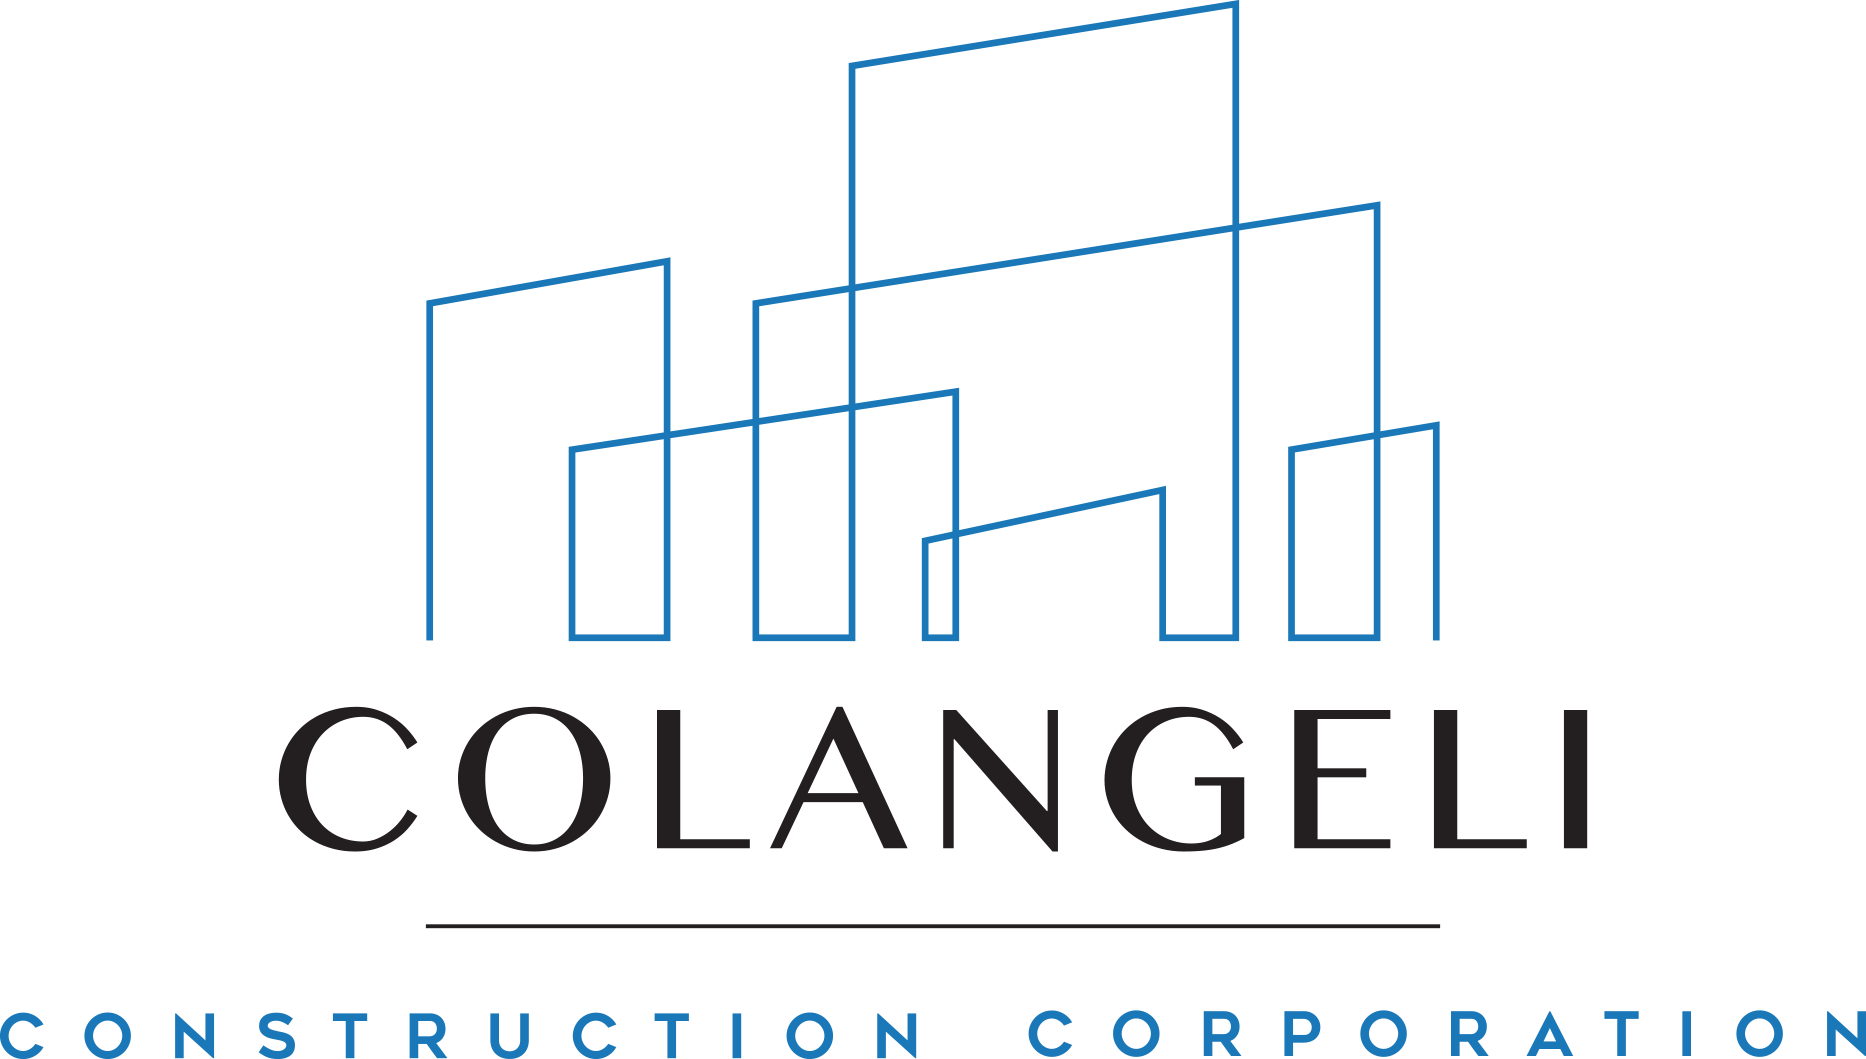 Colangeli Construction Corporation